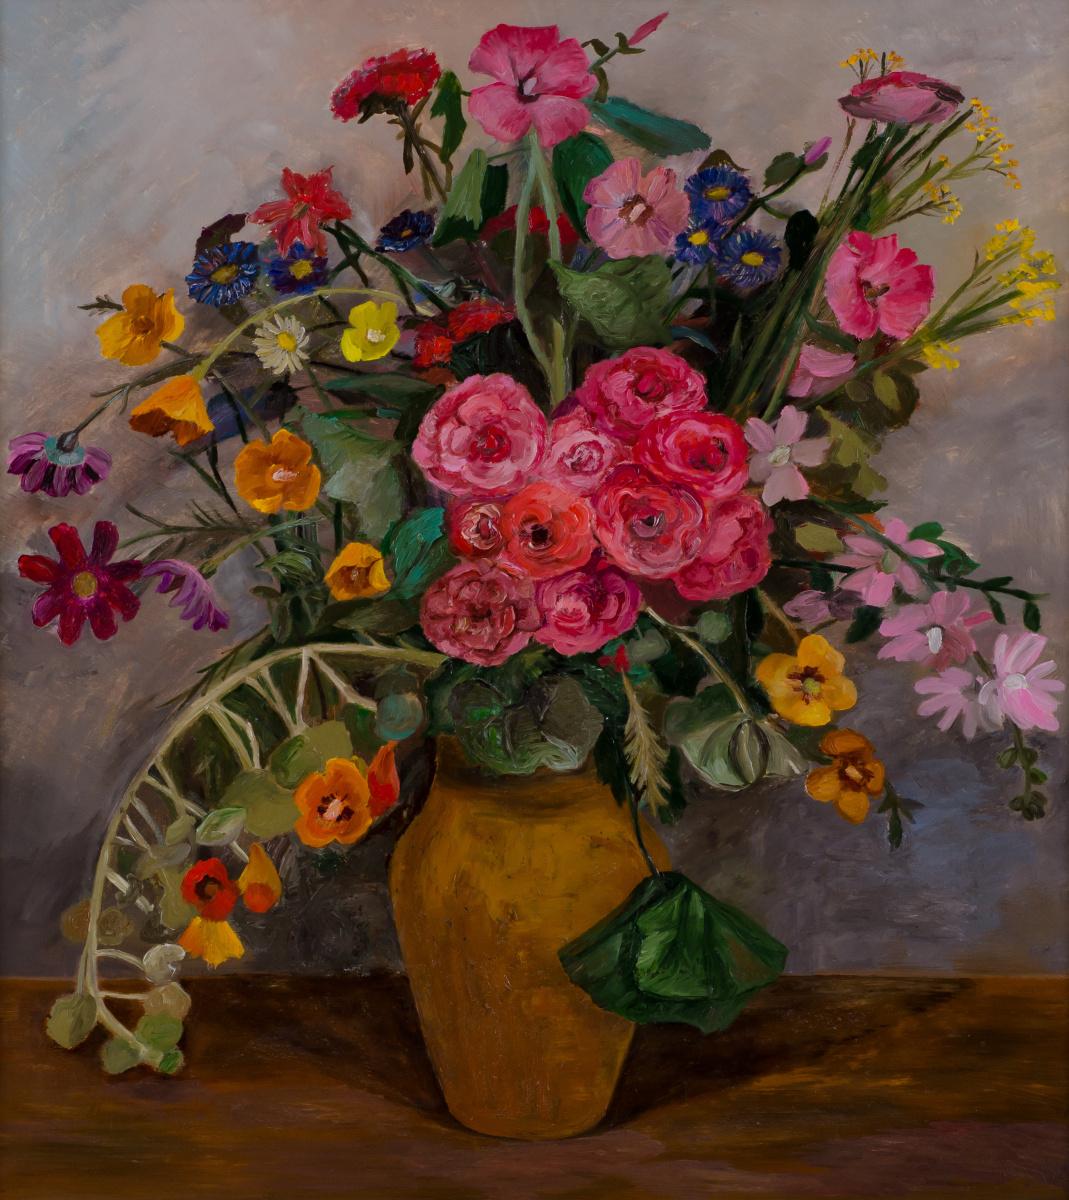 Tatiana Mykolaivna Motherland. Bouquet in a yellow vase